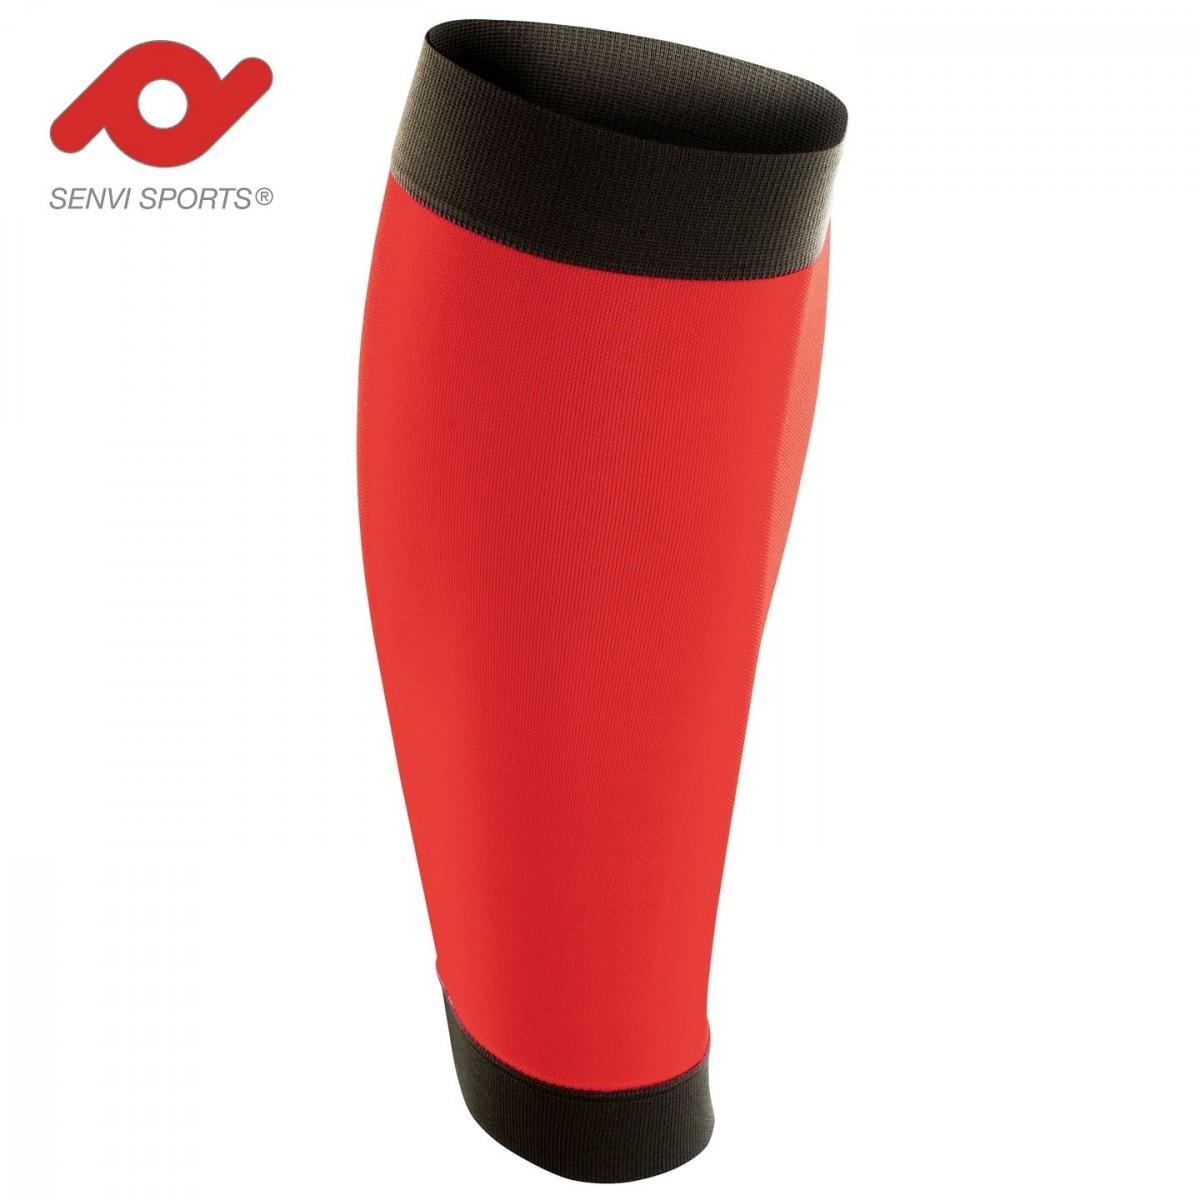 Senvi Sports Calf sleeves Compressie tubes Kleur Rood/Zwart Maat XS